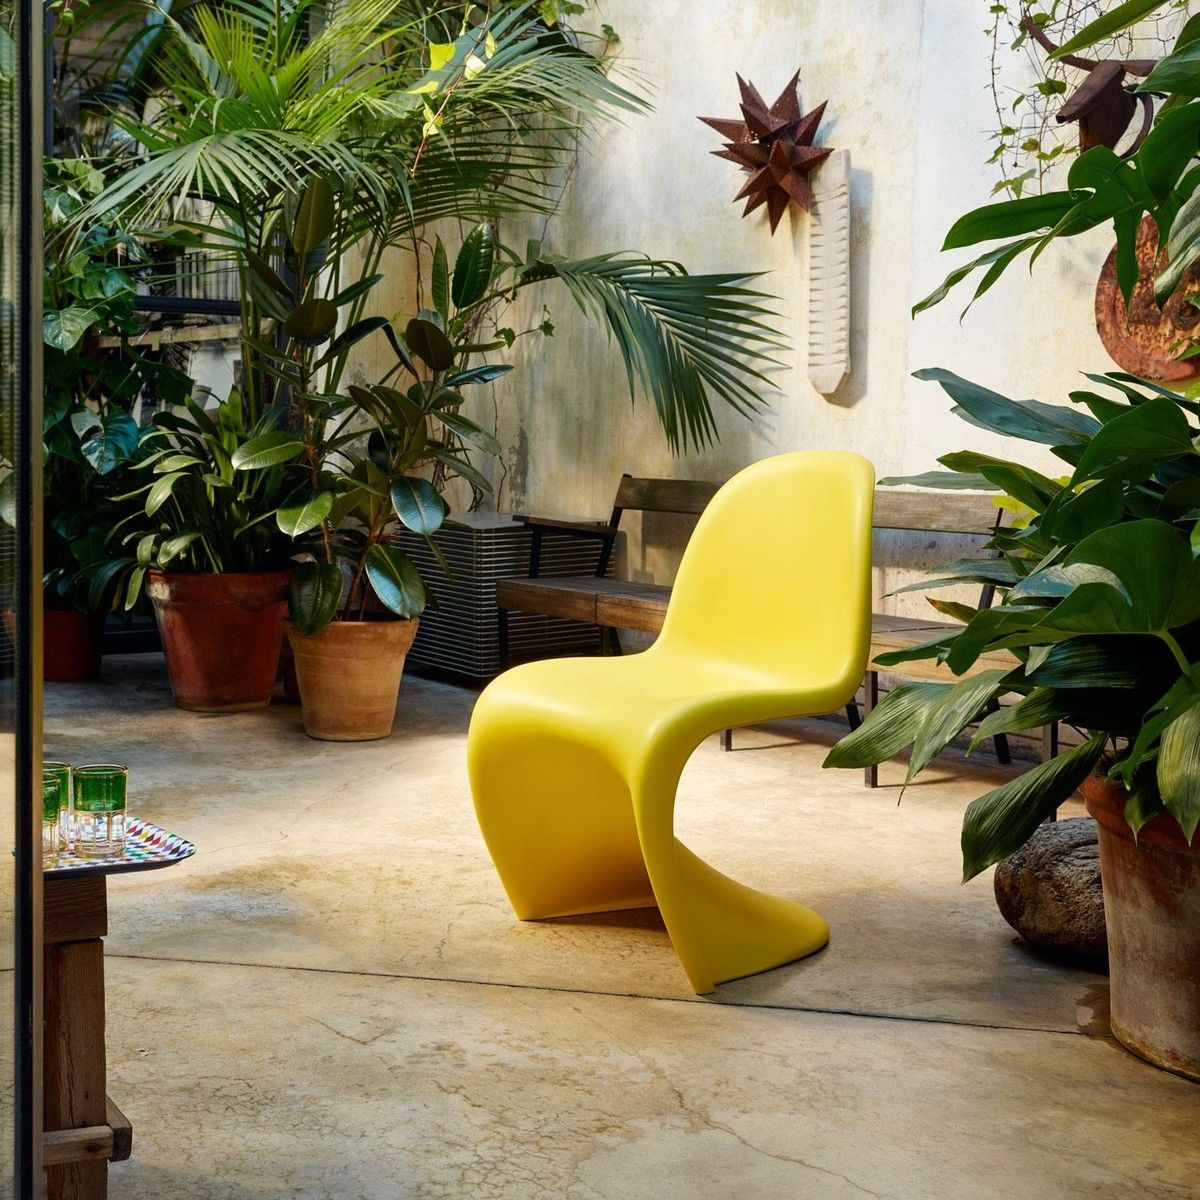 vitra panton chair limited edition - Panton Chair